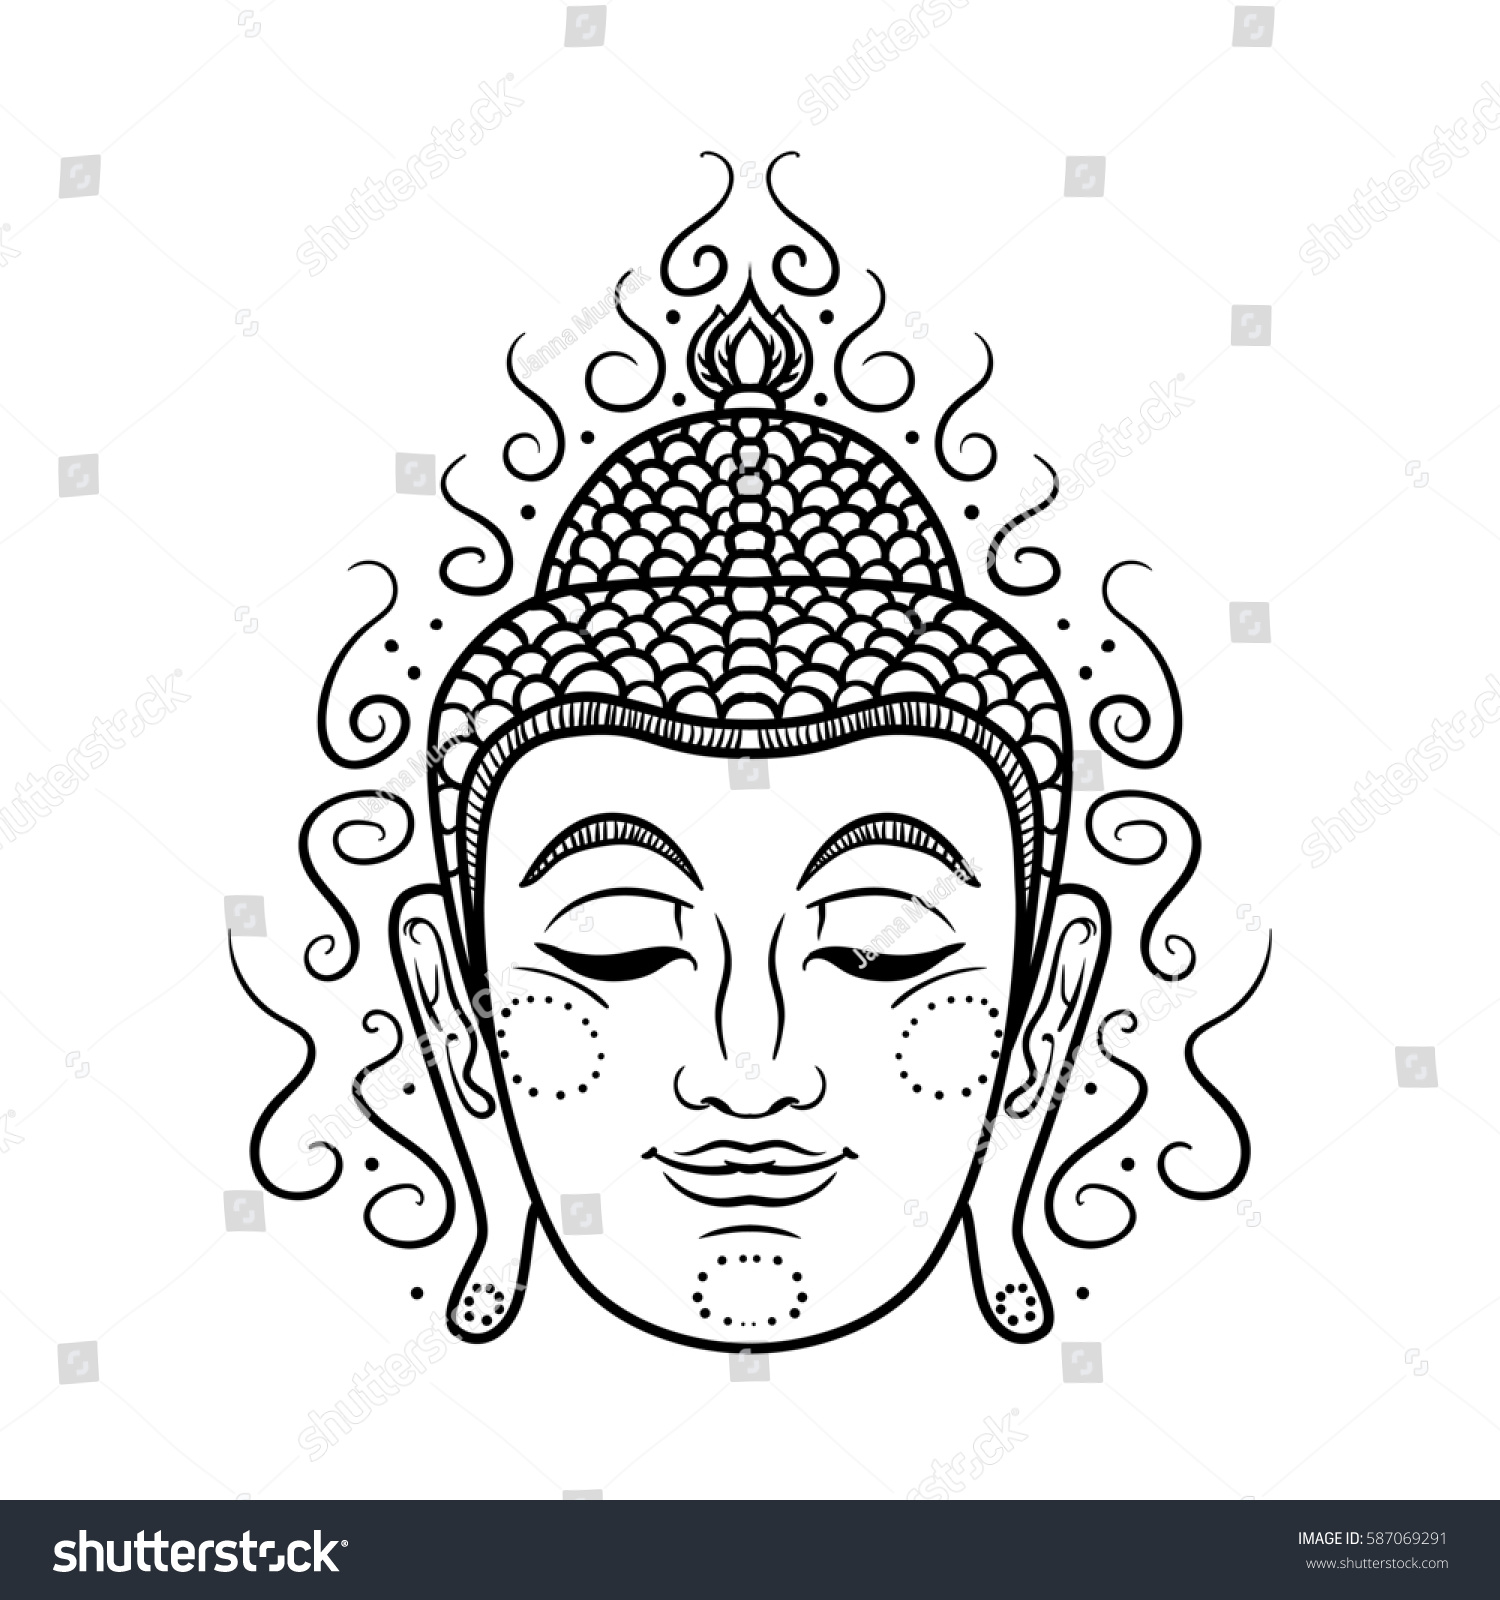 4a0e913bcbd3f Buddha face isolated on white. Esoteric vintage illustration. Indian,  Buddhism, spiritual art.